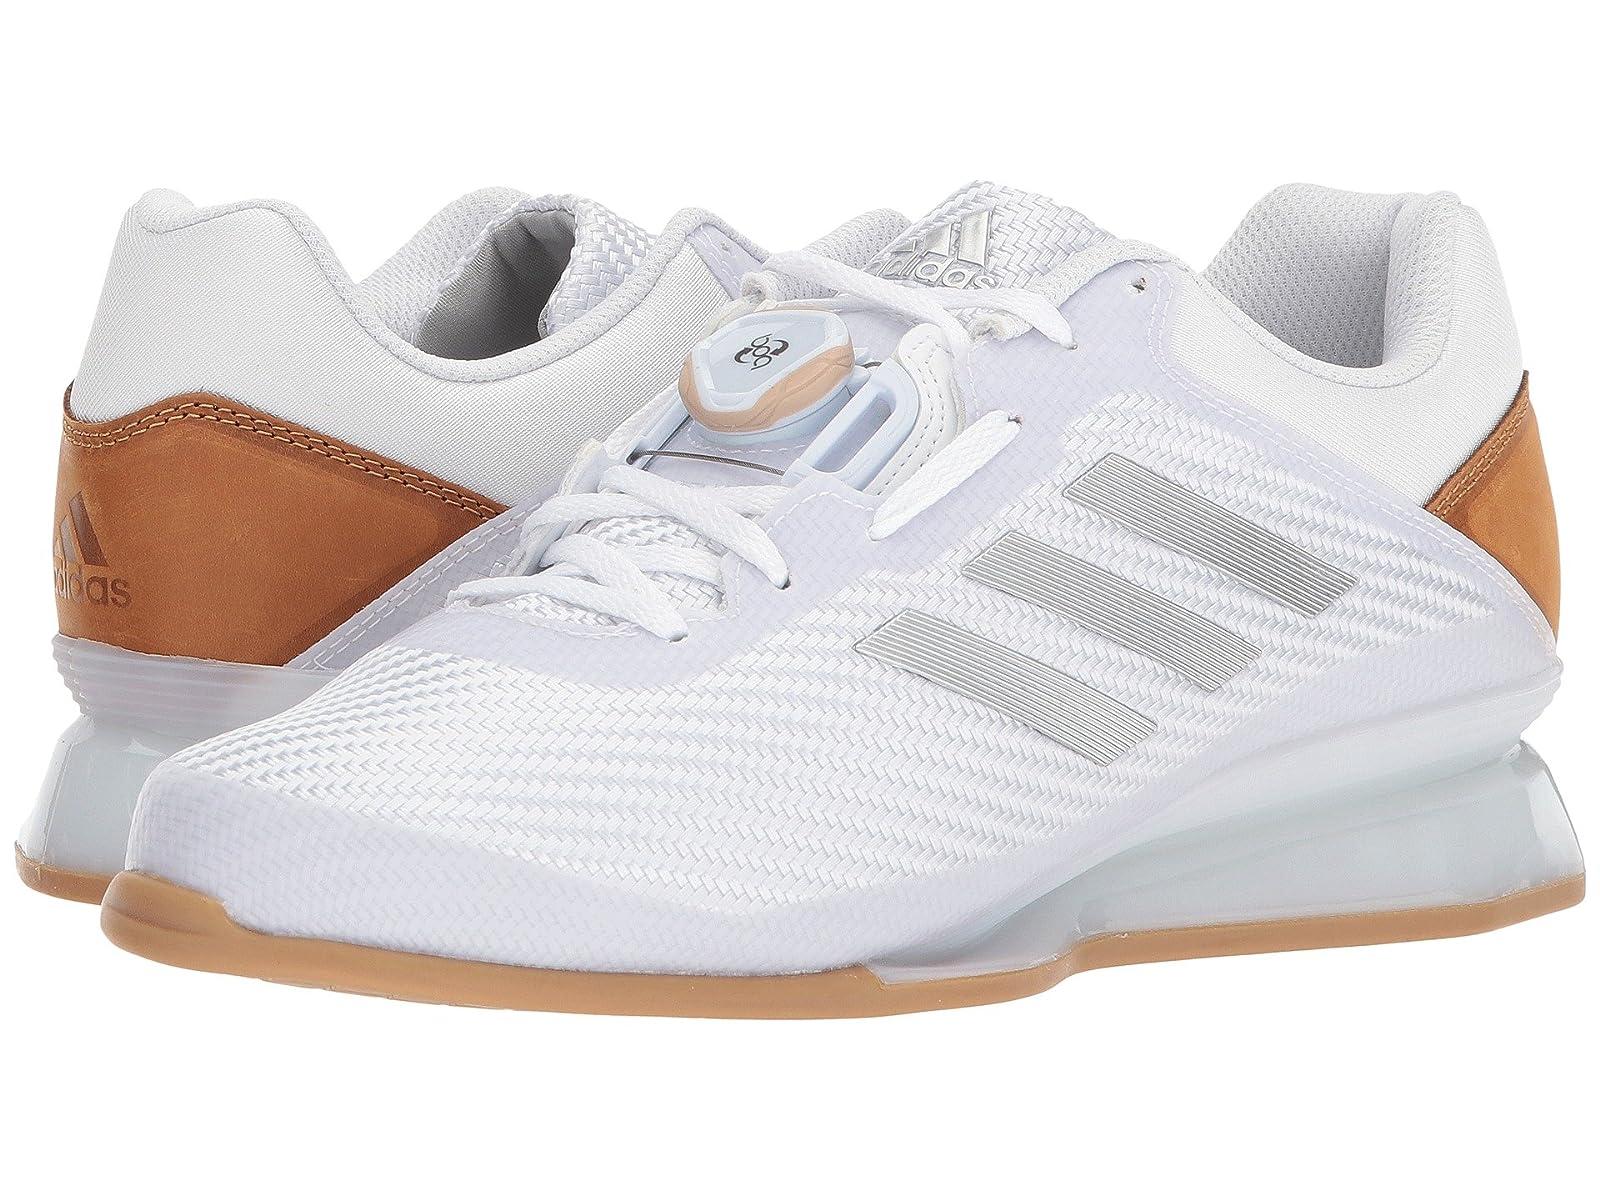 adidas Leistung 16 IIStylish and characteristic shoes